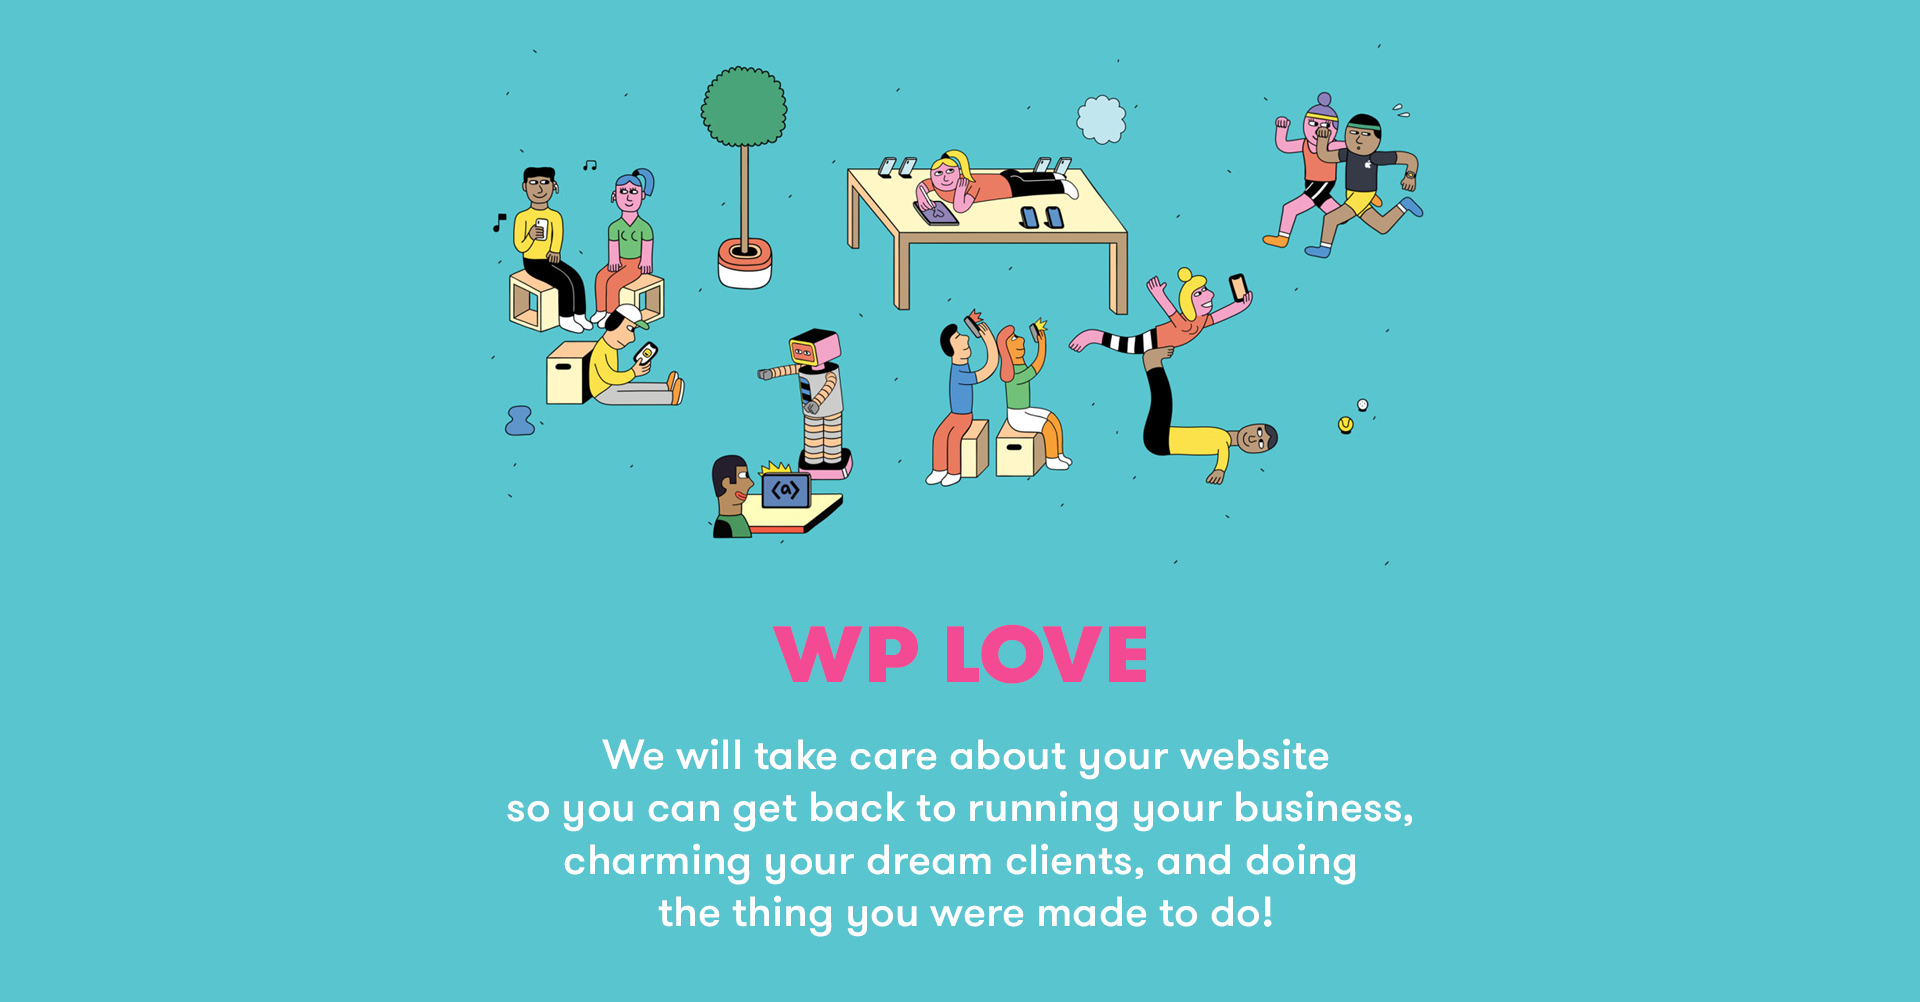 wp love